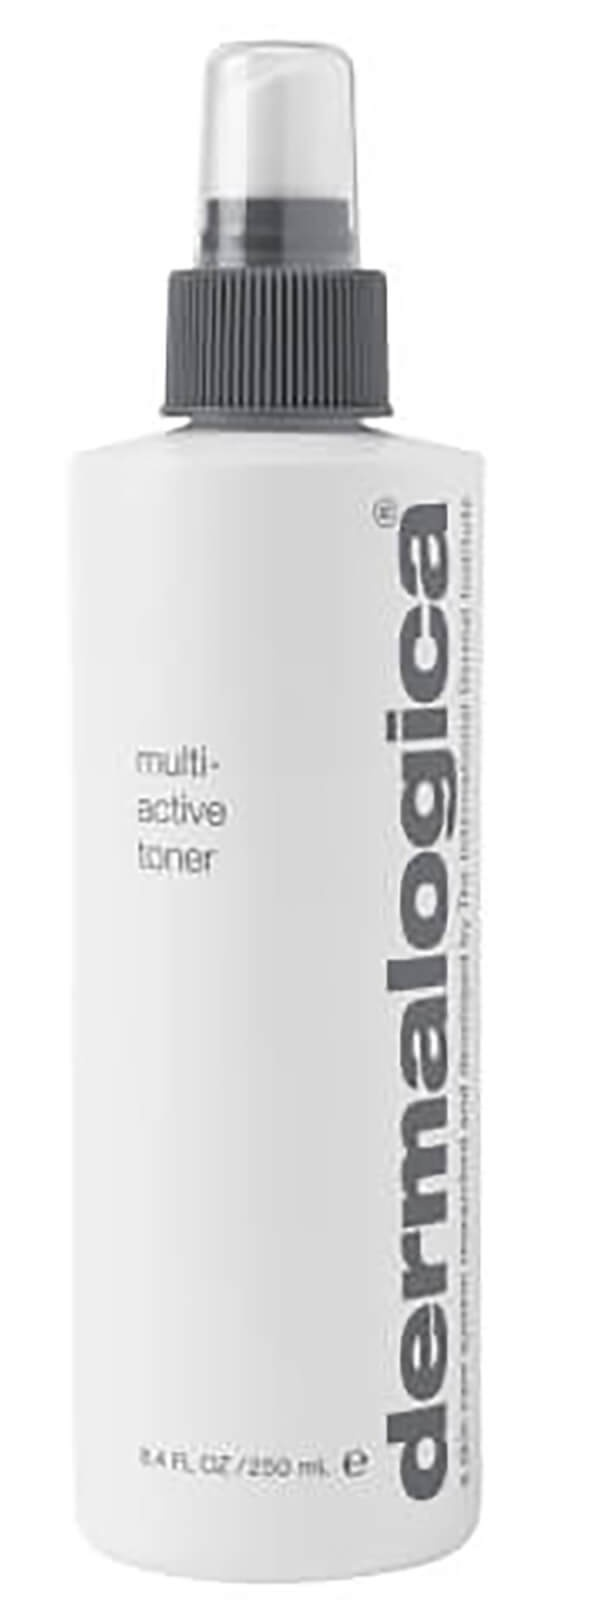 Dermalogica Multi-Active Toner